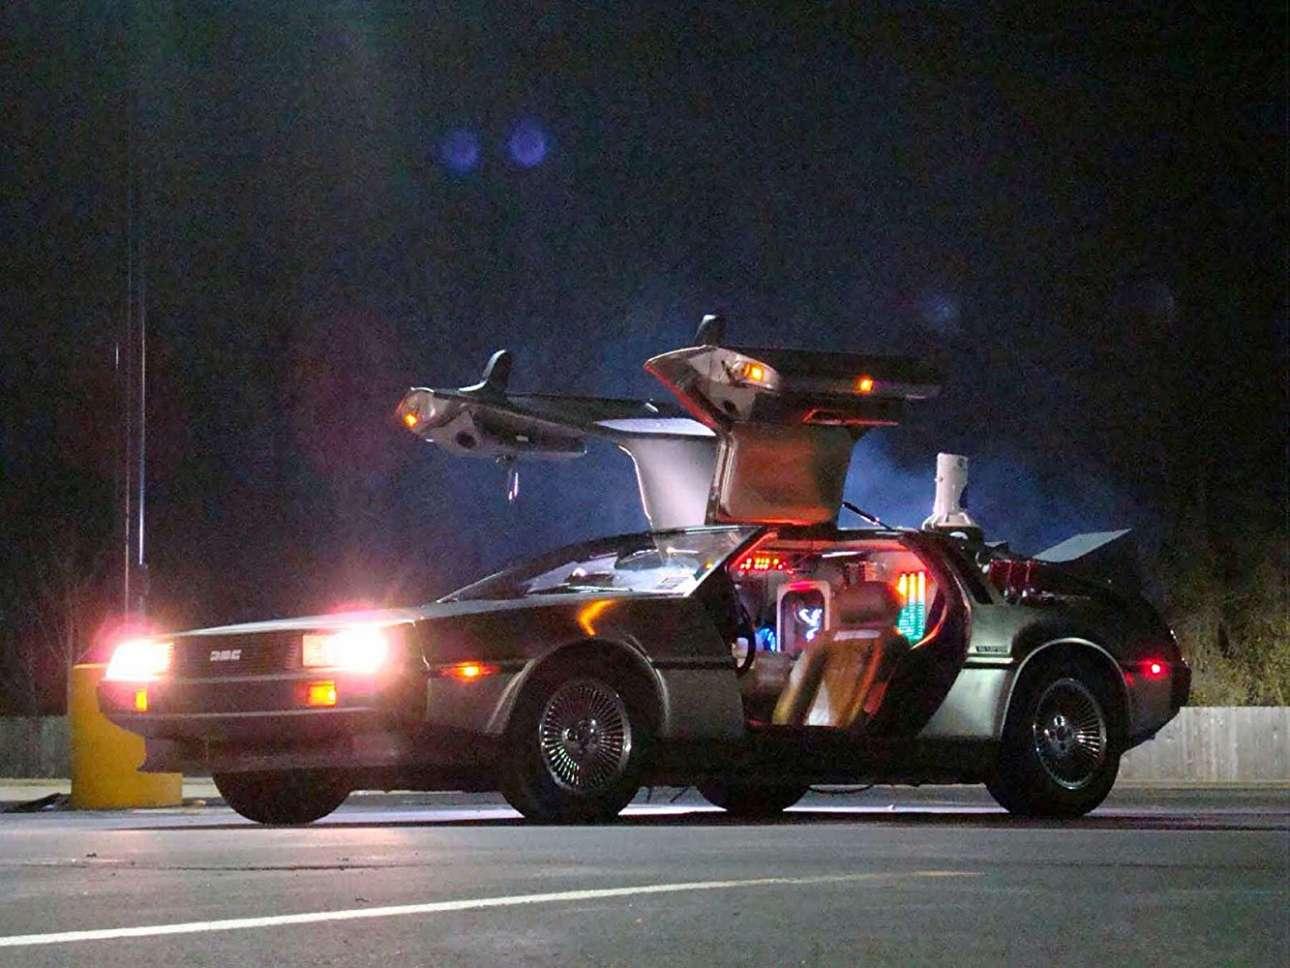 DeLorean DMC-12. Το μοναδικό μοντέλο στη βραχύβια ιστορία της DeLorean (1981-82), η φουτουριστική DMC-12, πρωταγωνίστησε στο φιλμ «Επιστροφή στο μέλλον». Για τις ανάγκες της ταινίας, αλλά και των δύο συνεχειών της (1989 και 1990), χρησιμοποιήθηκαν 6 DMC-12, με τον περίφημο ήχο τους από V8 κινητήρα στην ταινία να είναι προϊόν επεξεργασίας, αφού η Delorean φορούσε μικρότερα μοτέρ. Συναρμολογήθηκε σε ένα προάστιο του Μπέλφαστ και έβγαλε μόλις 9.000 κομμάτια, προτού σταματήσει την παραγωγή του